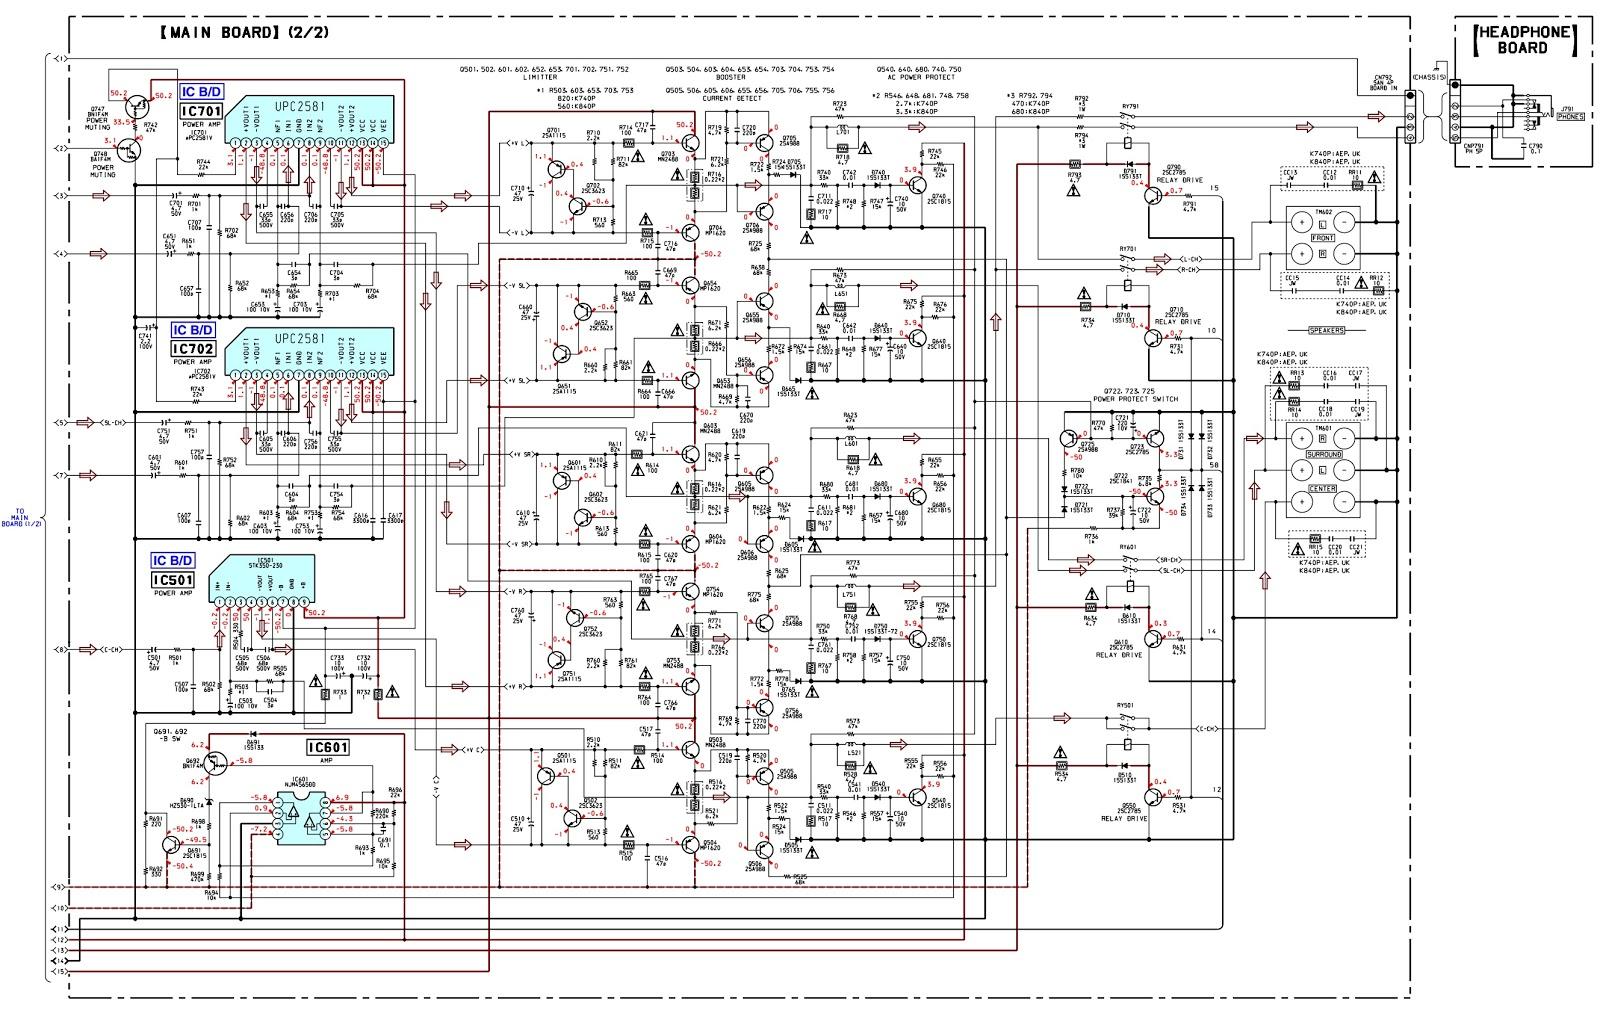 sony receiver wiring diagrams active pickup wiring xo vision xd103 manual xo vision xod1750 [ 1600 x 1011 Pixel ]